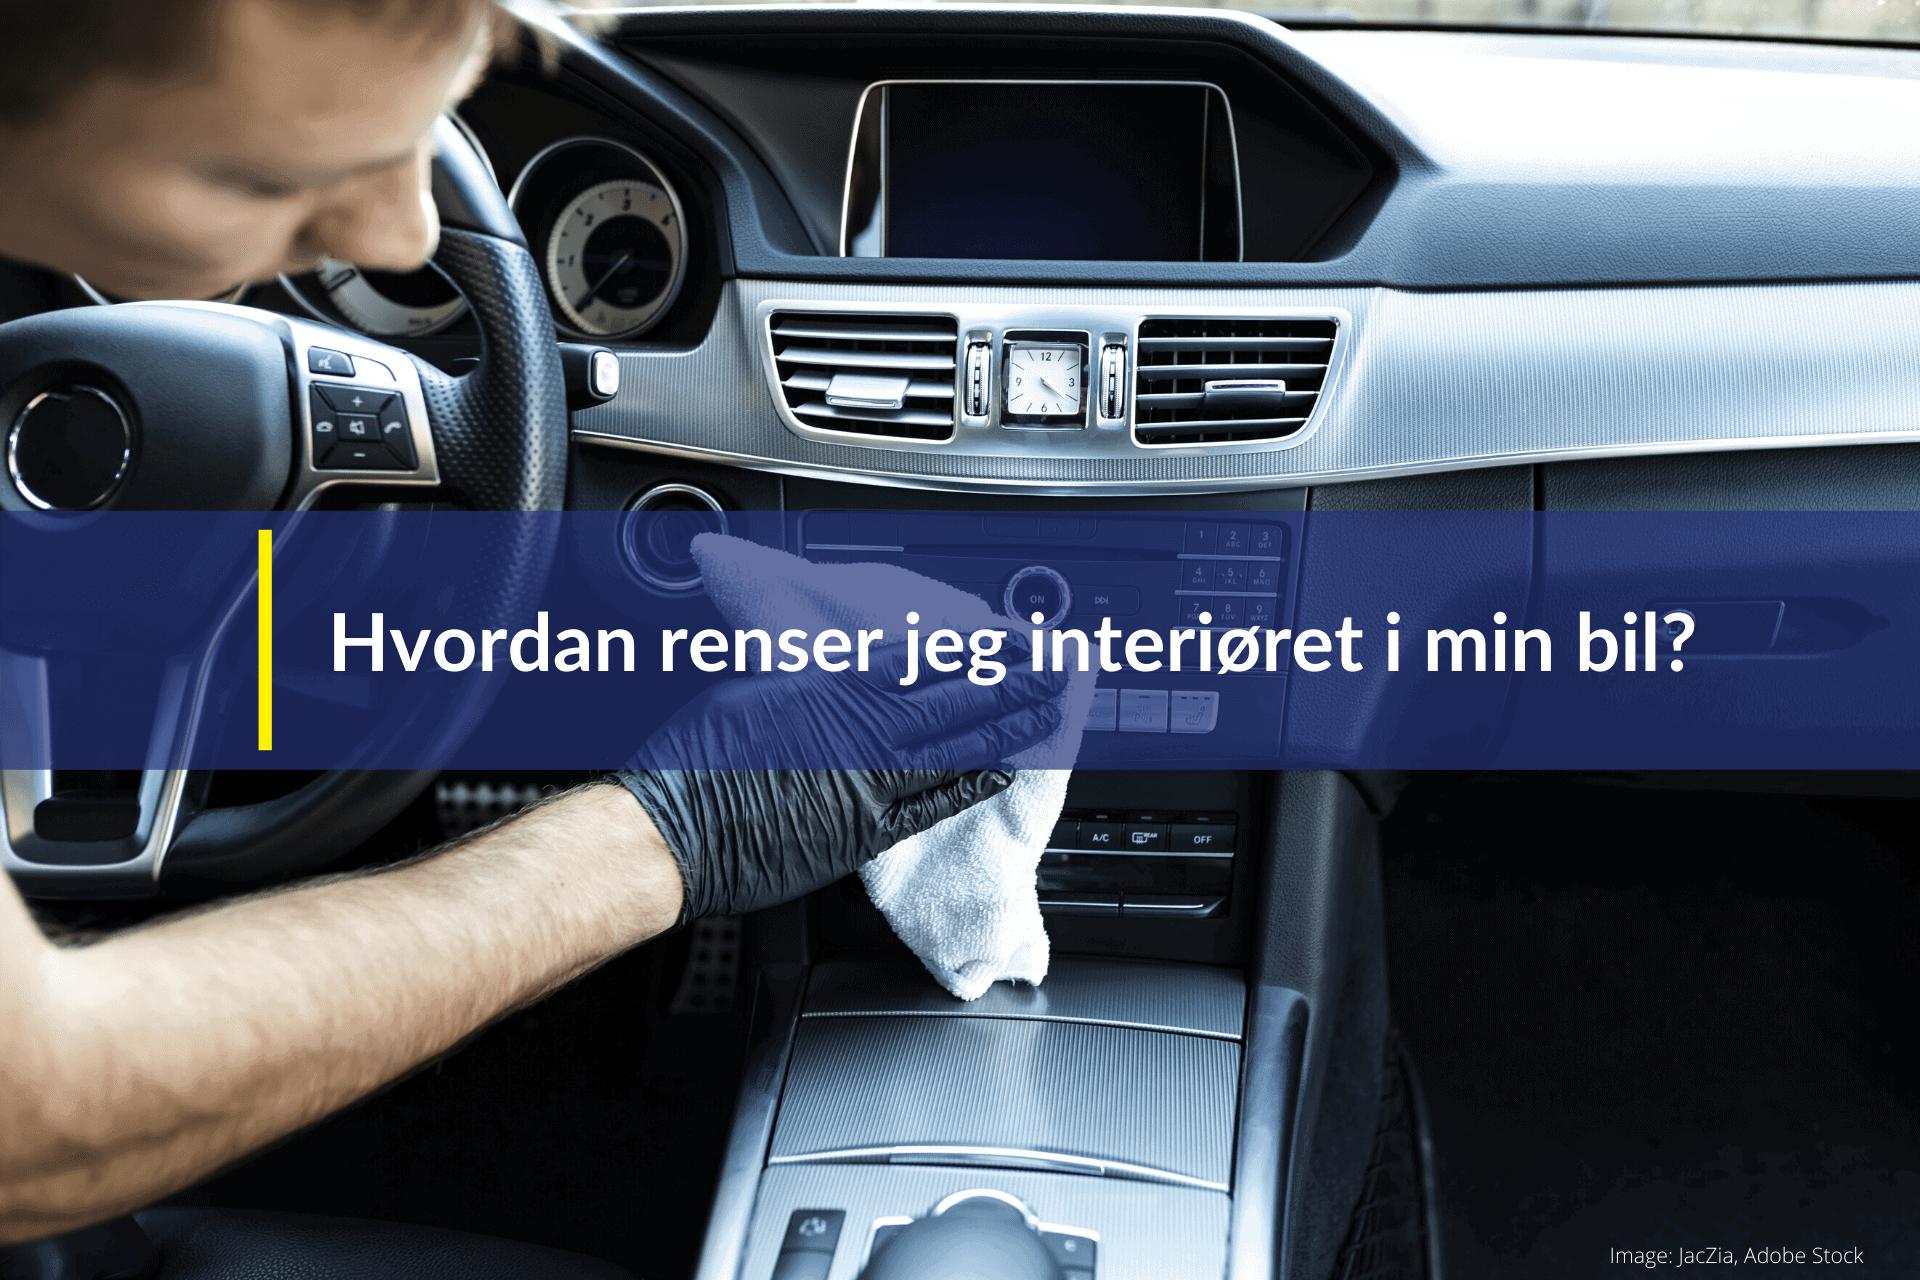 hvordan renser jeg interiøret i min bil